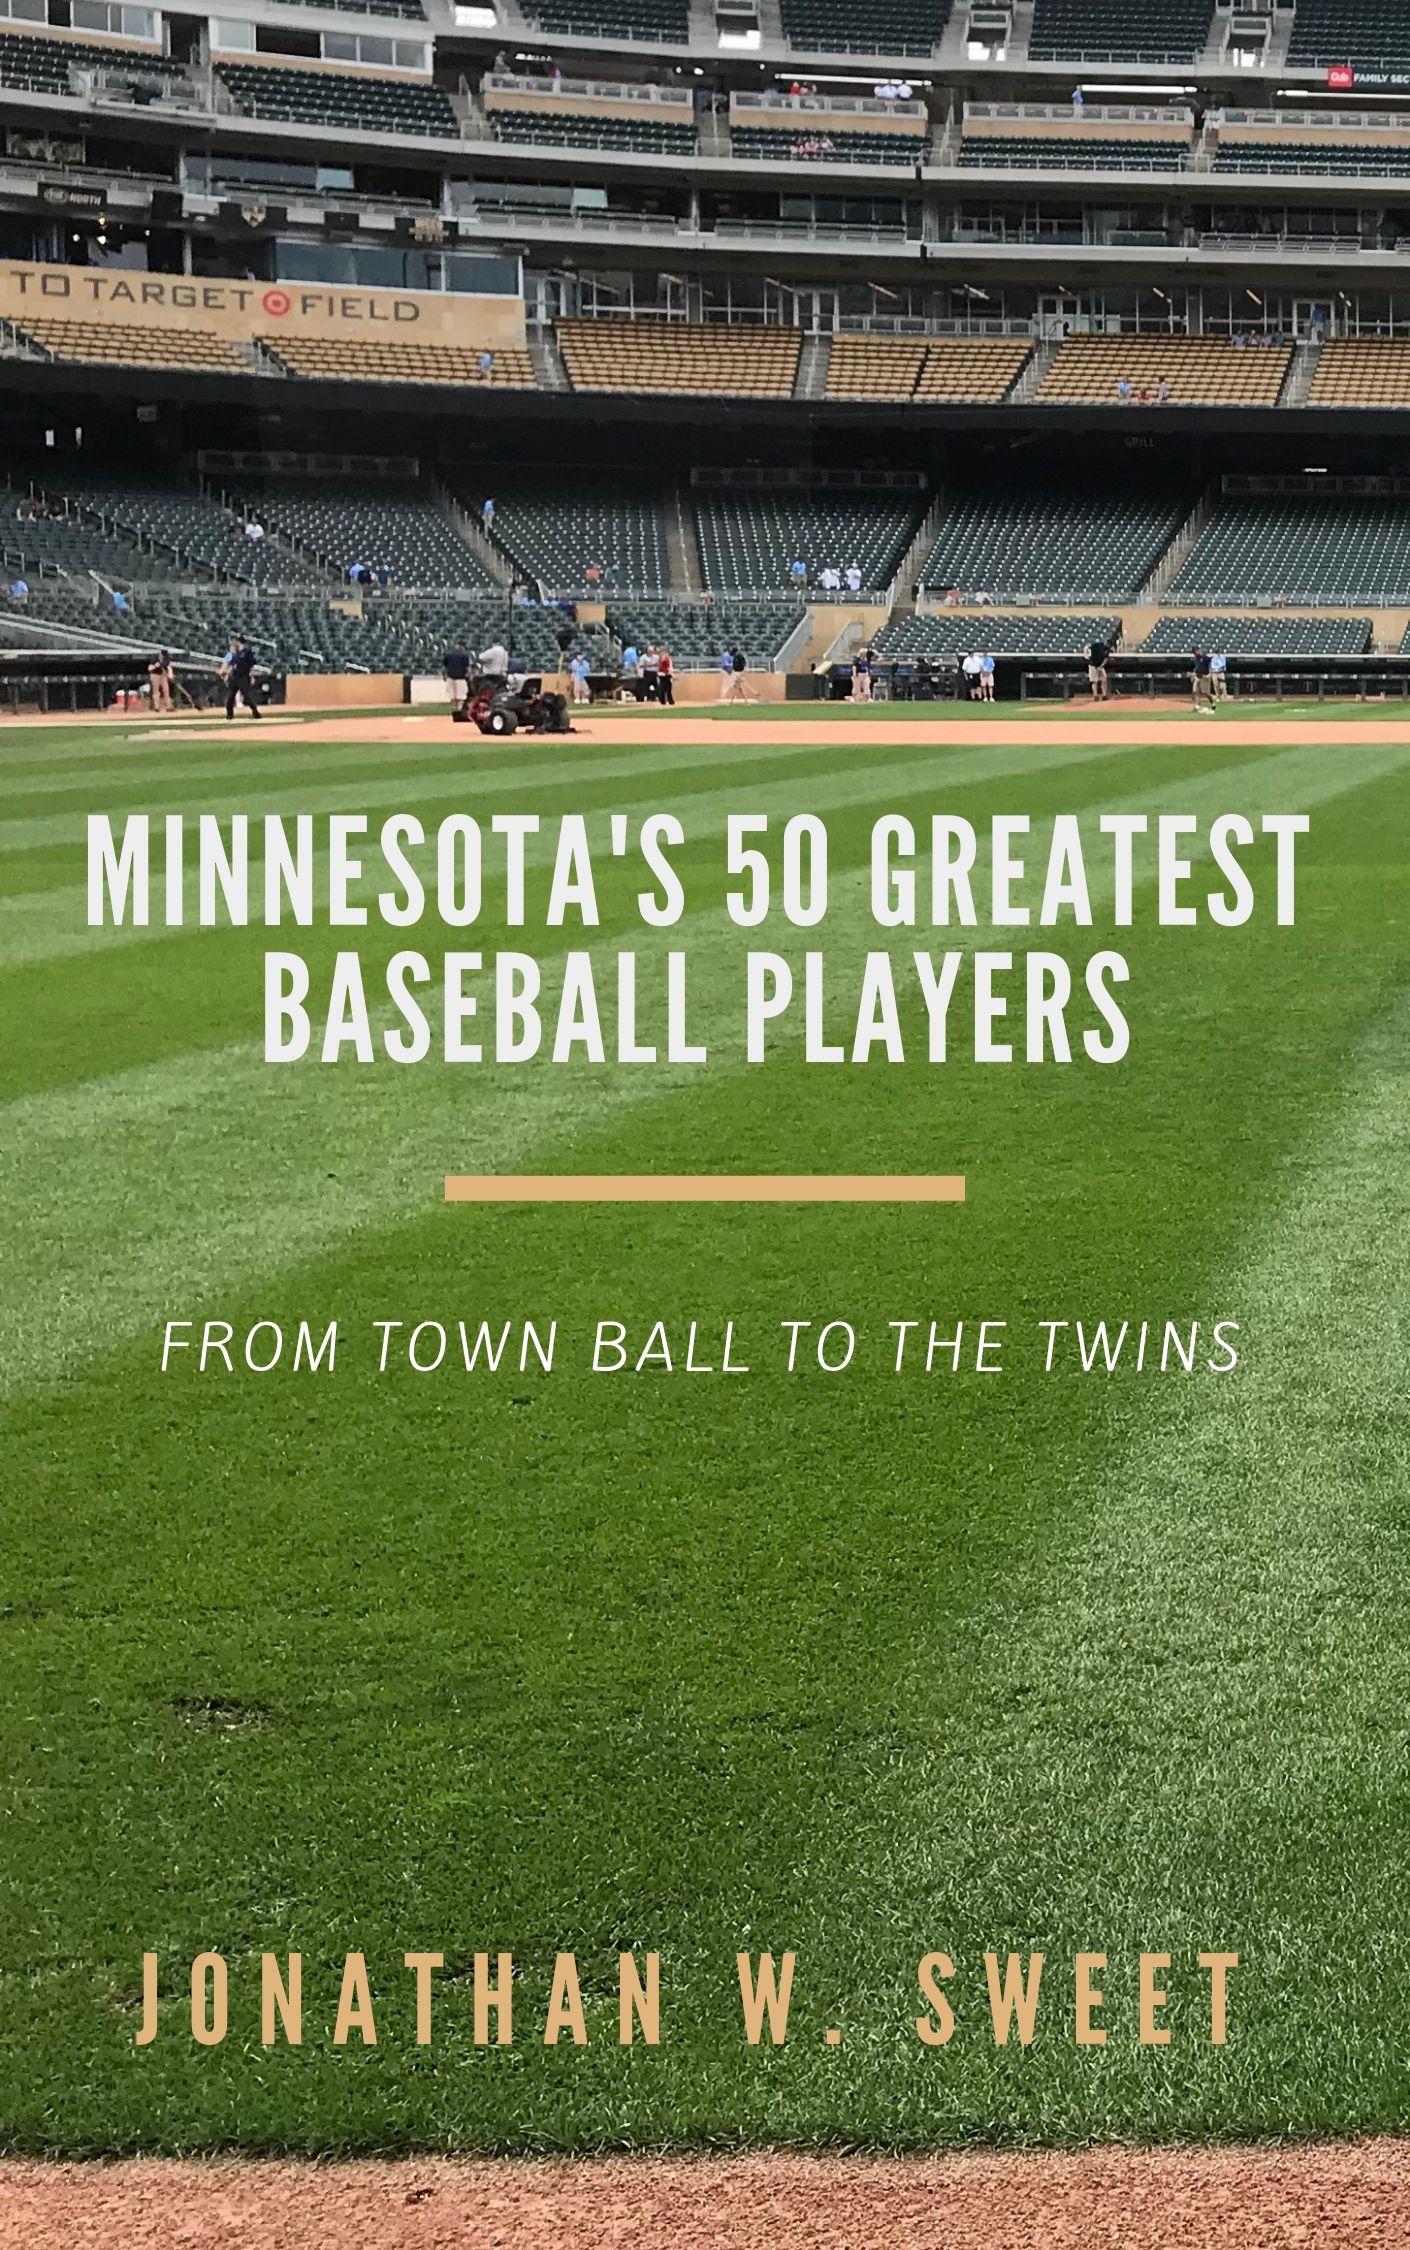 Minnesota's 50 greatest baseball players